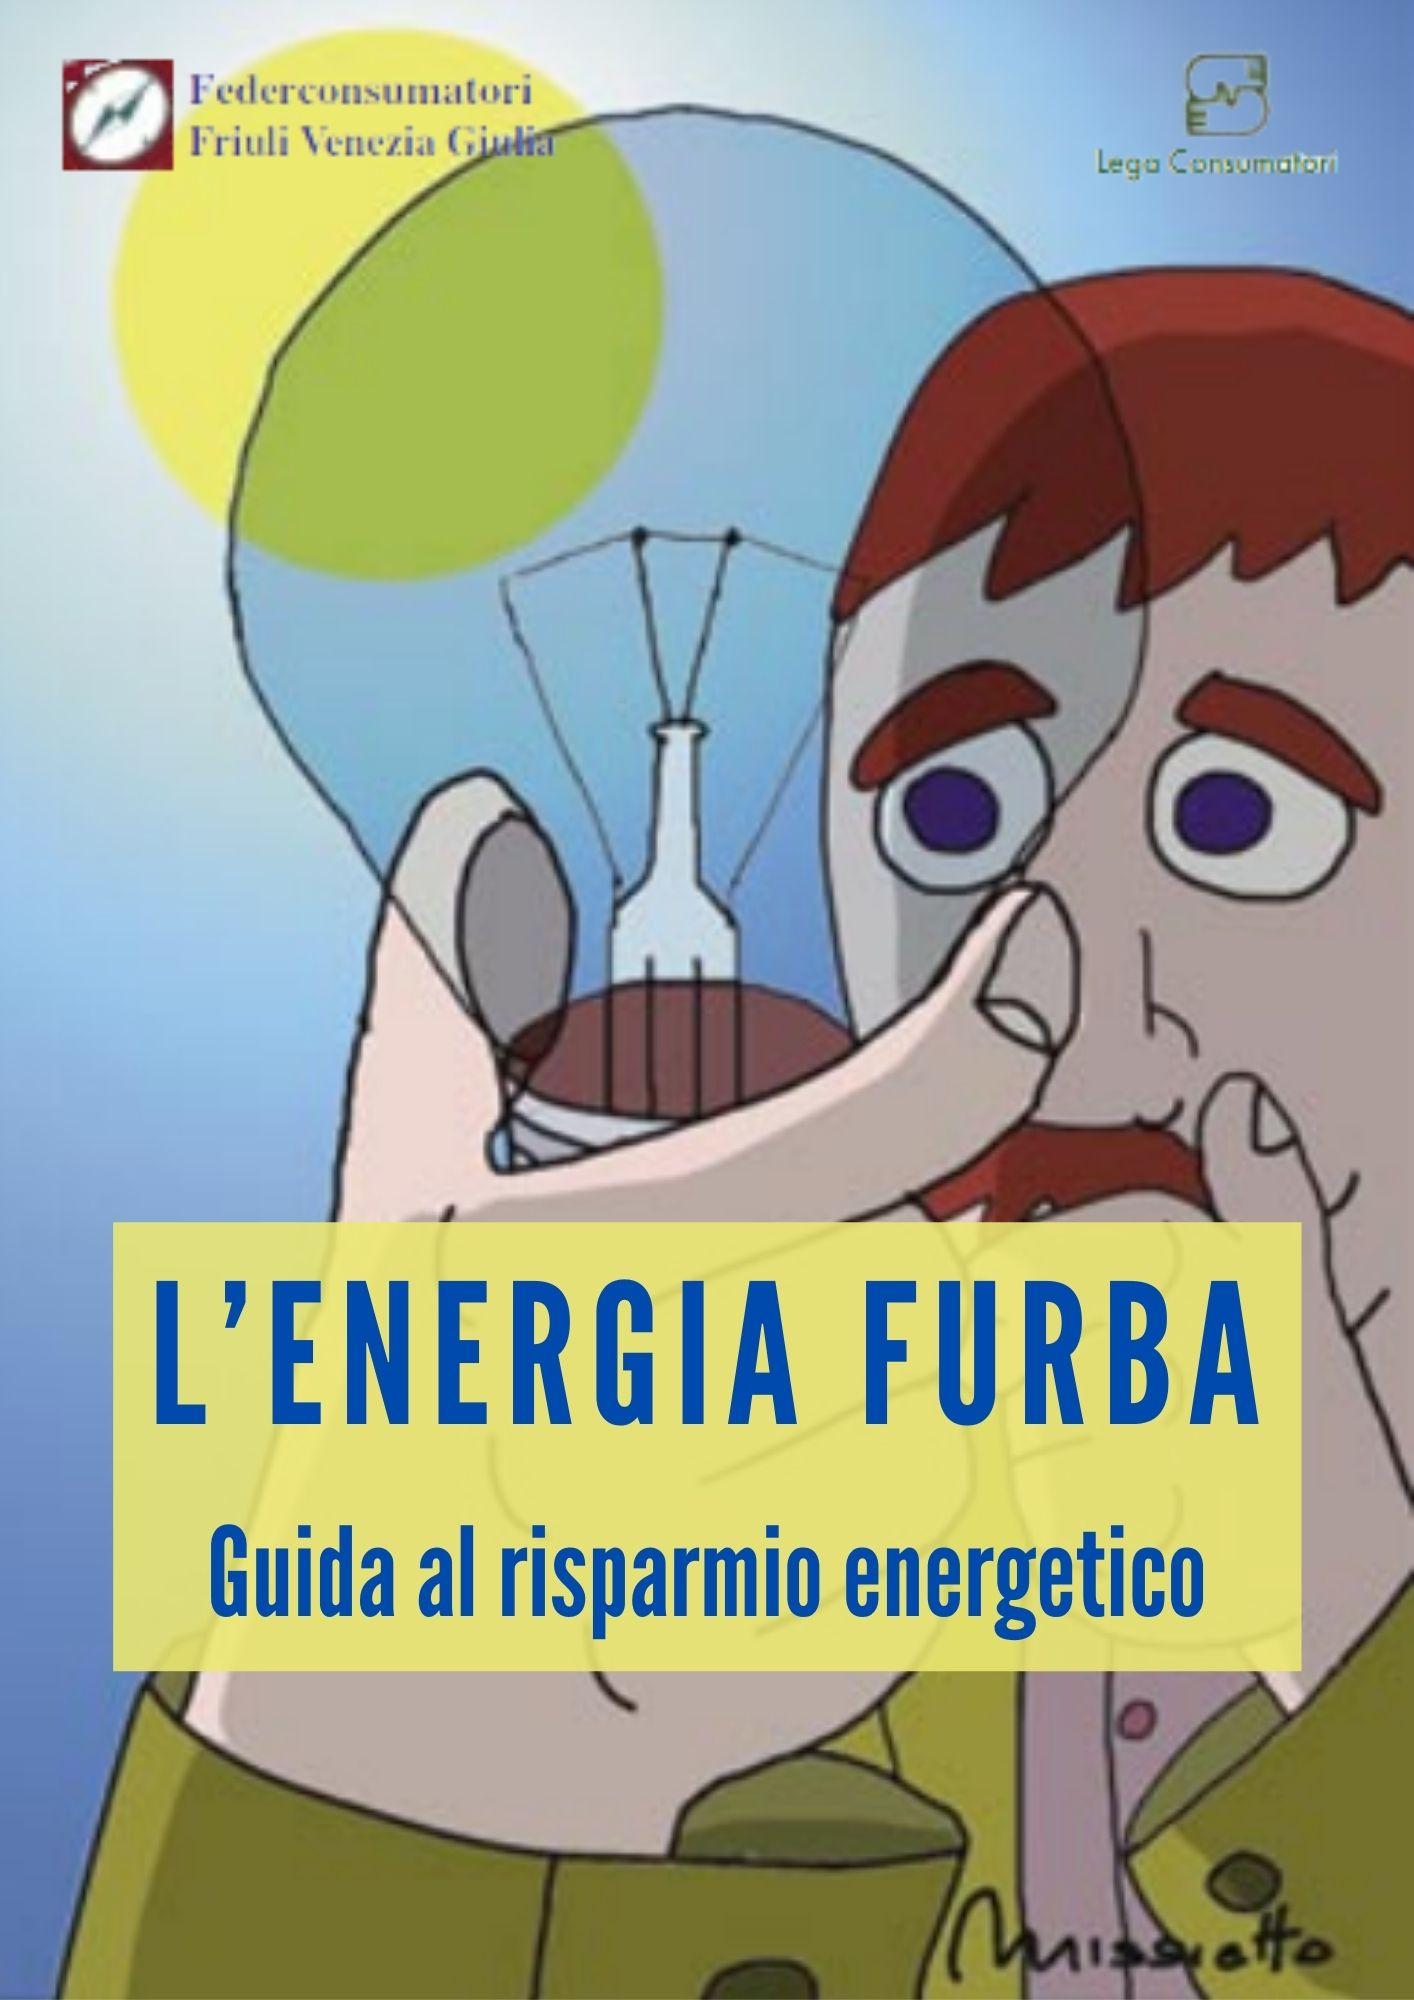 energia furba guida risparmio energetico